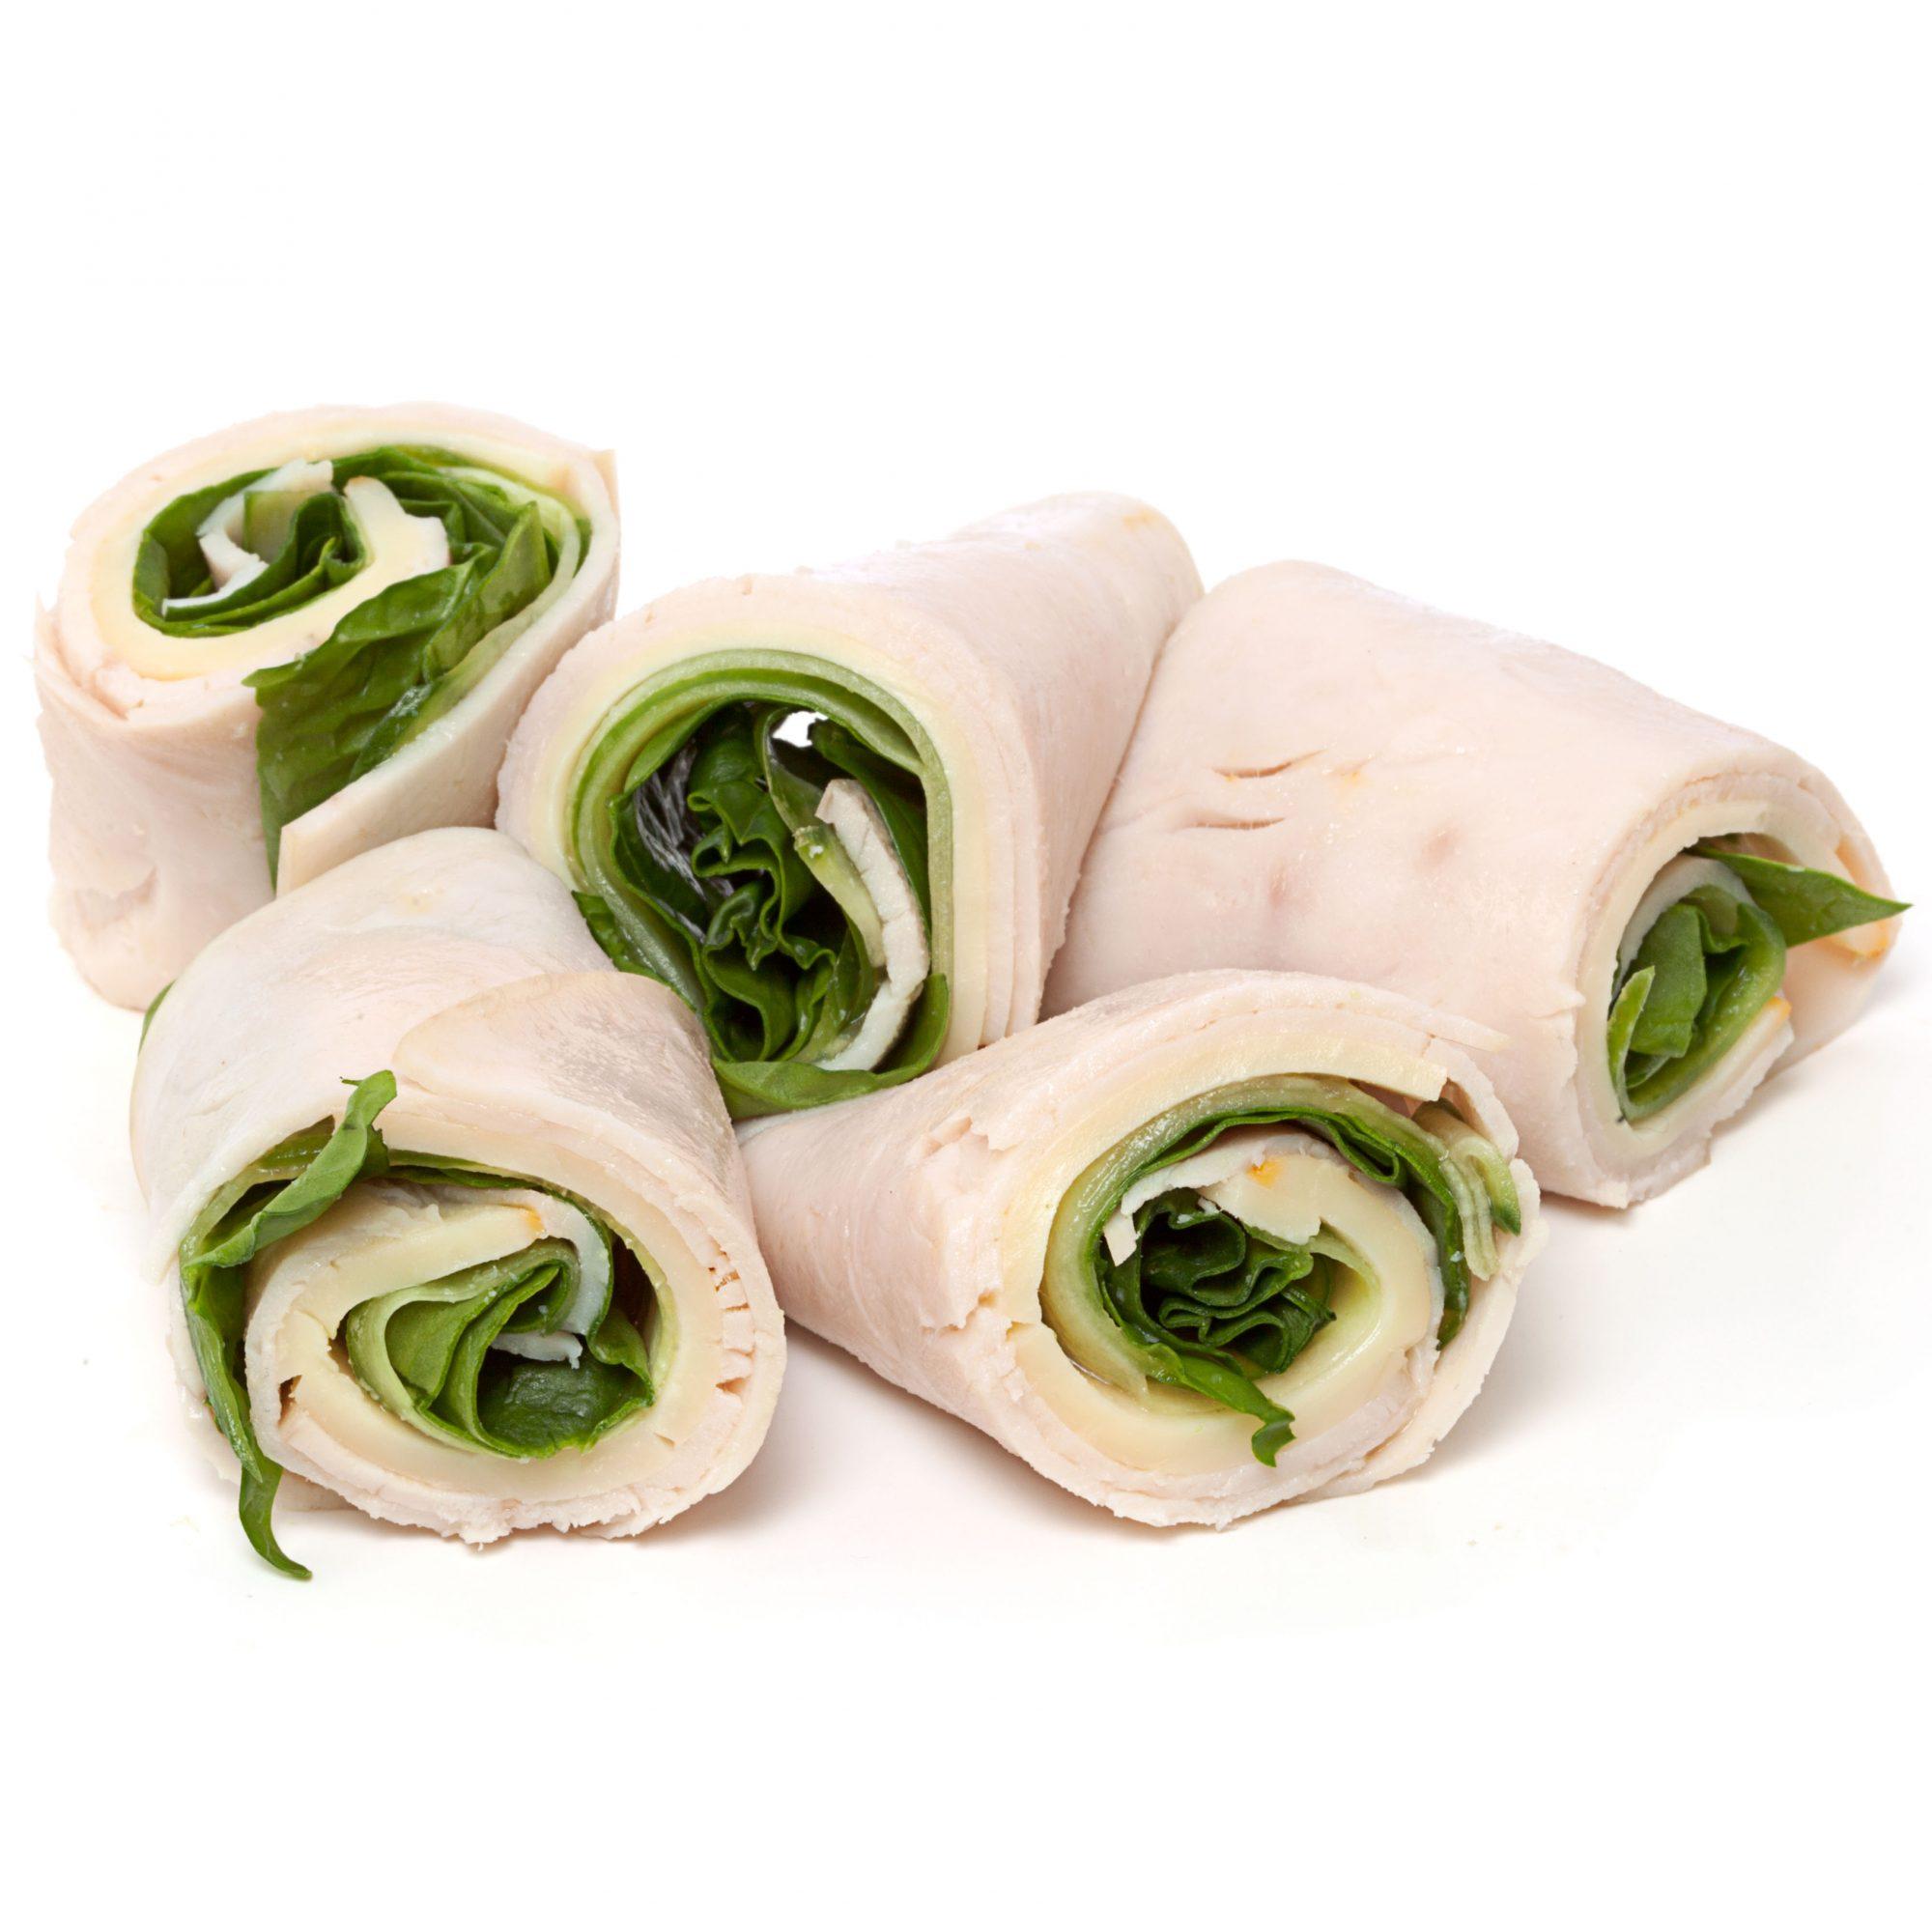 Turkey & Spinach Rollups